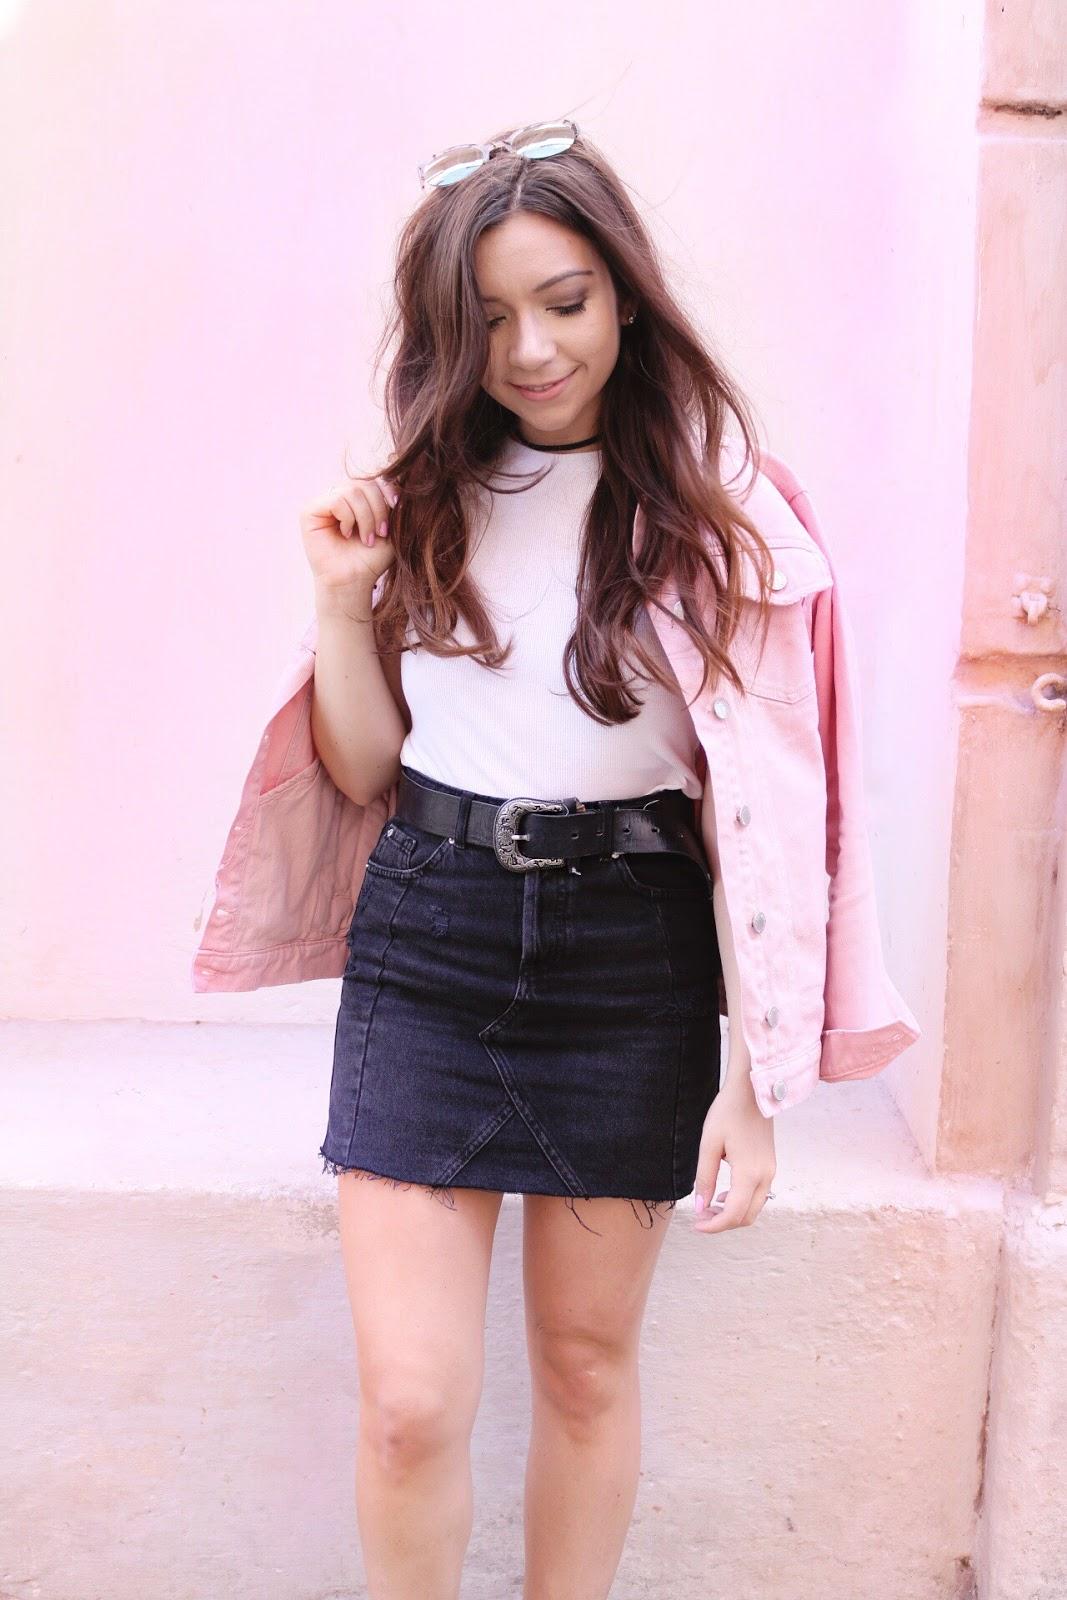 d7b44ae6f Three Ways To Style A Denim Skirt - Dizzybrunette